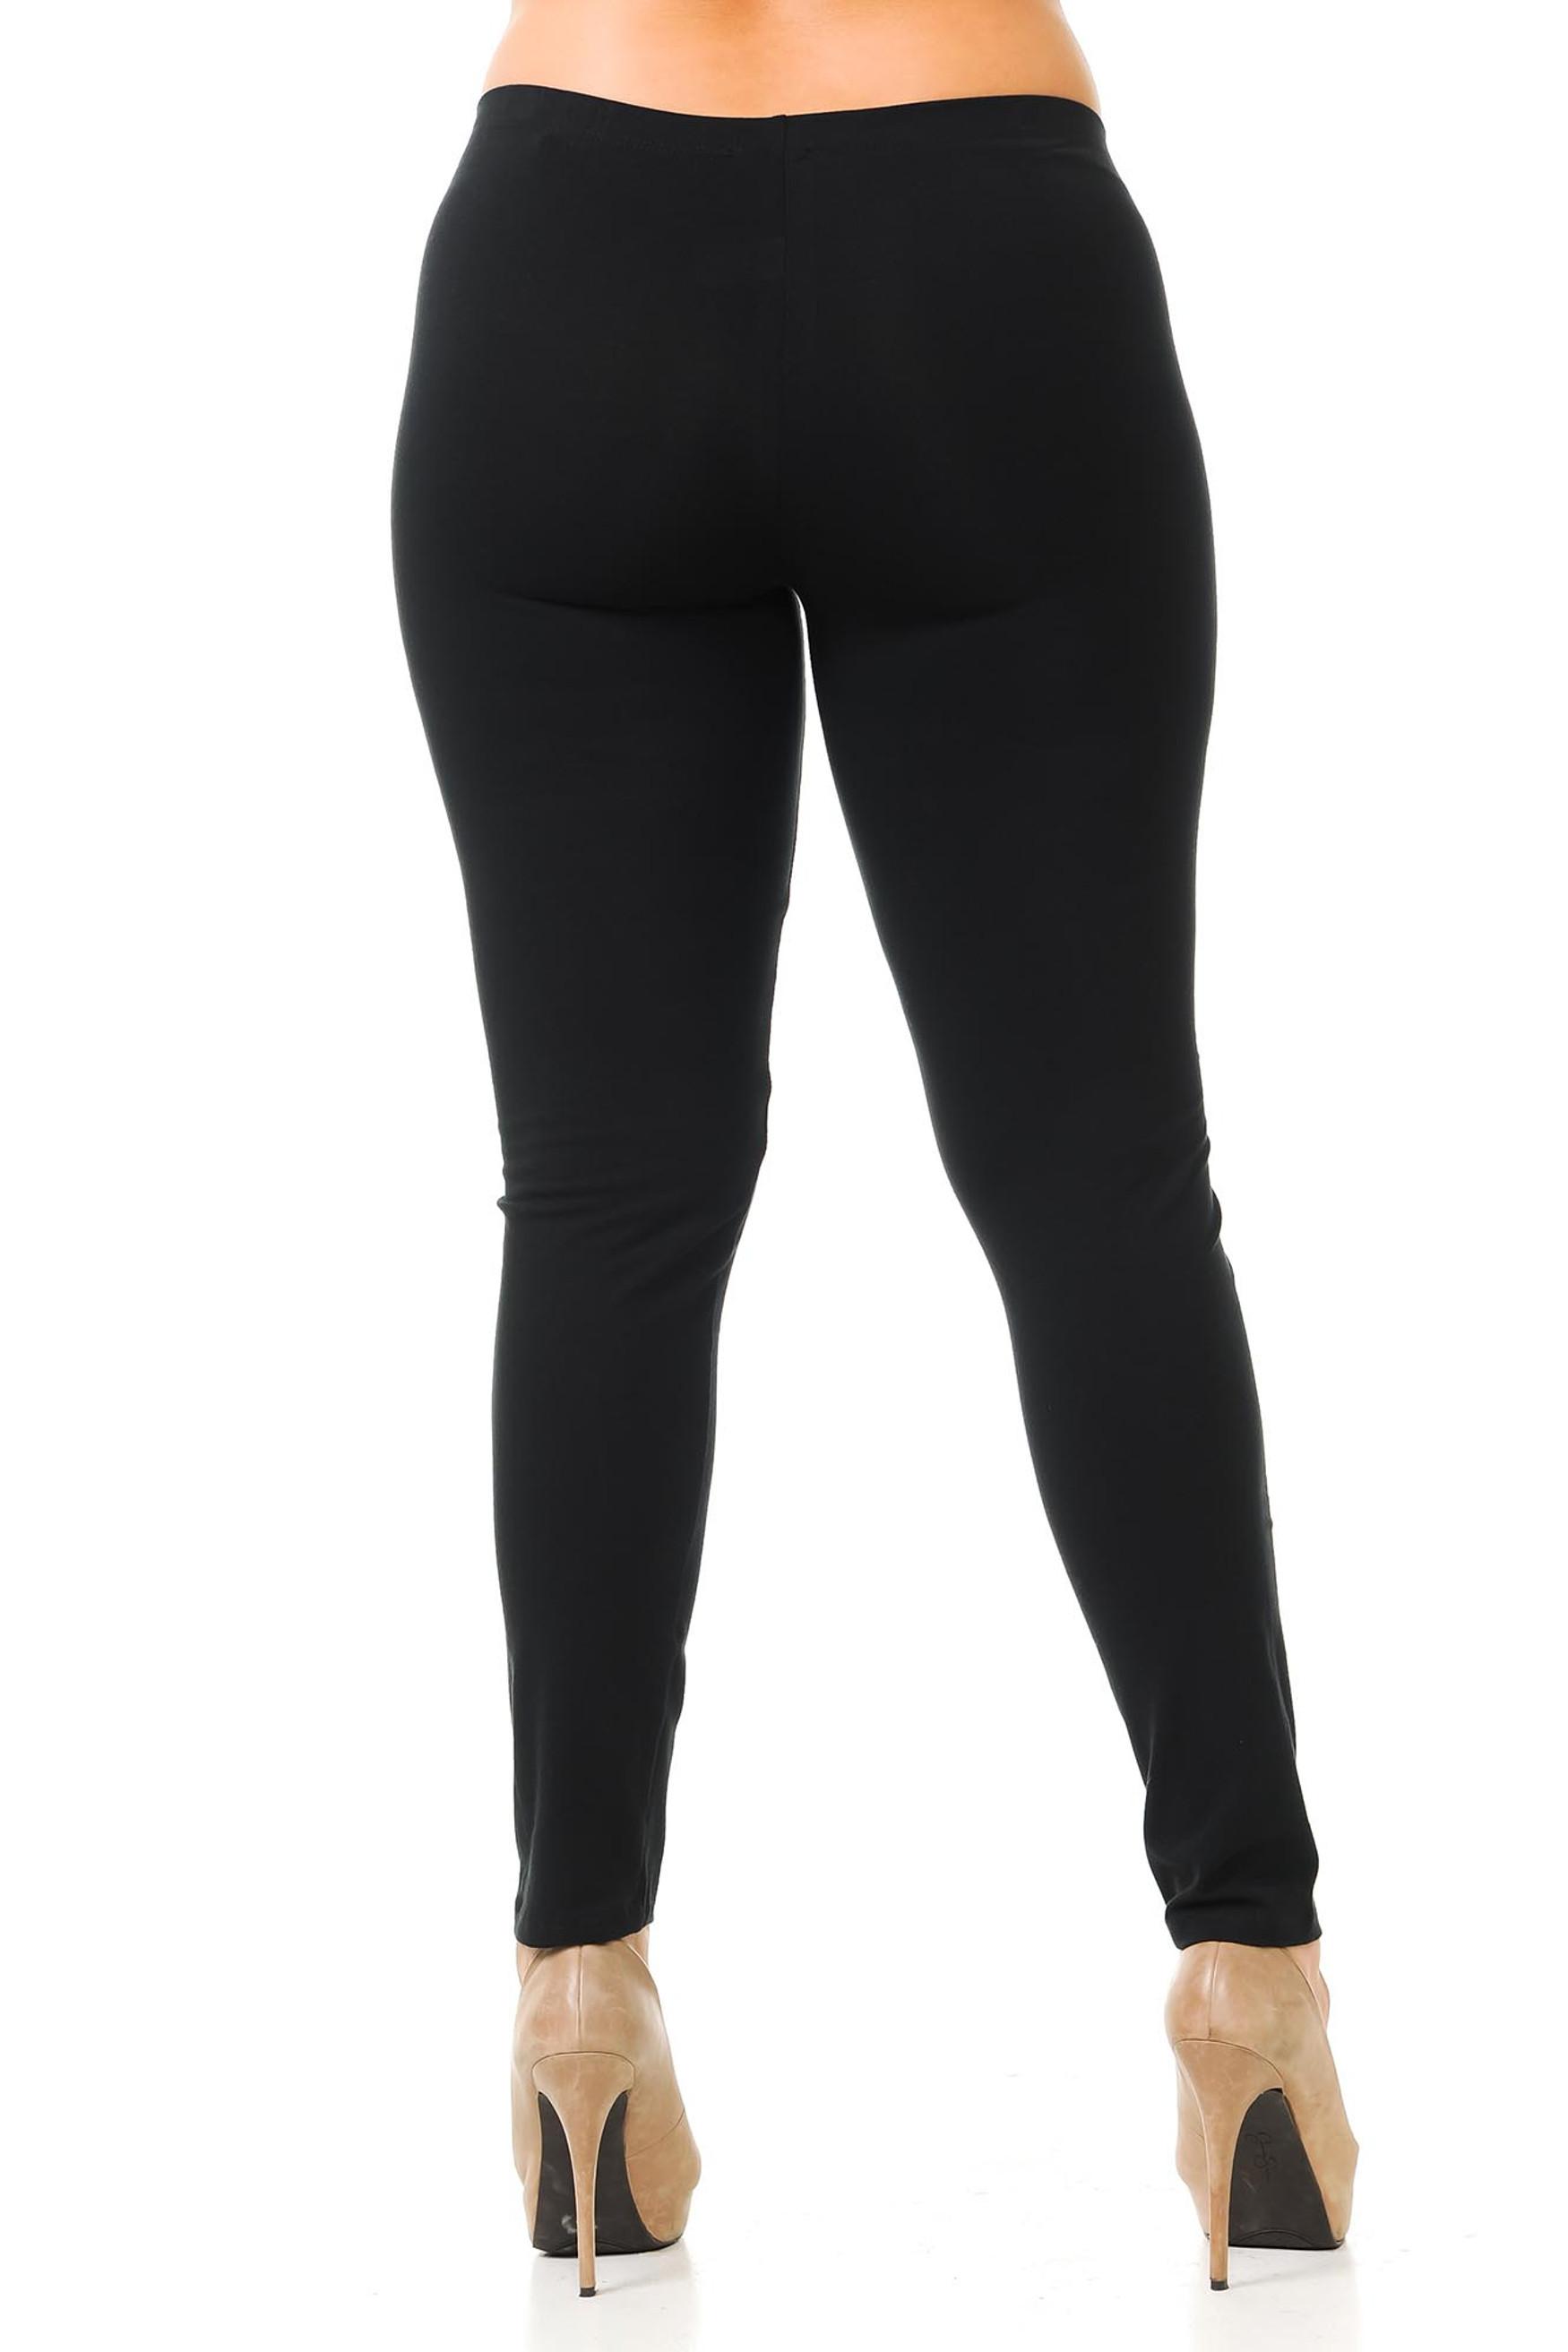 Rear view image of Black USA Cotton Full Length Leggings - Plus Size